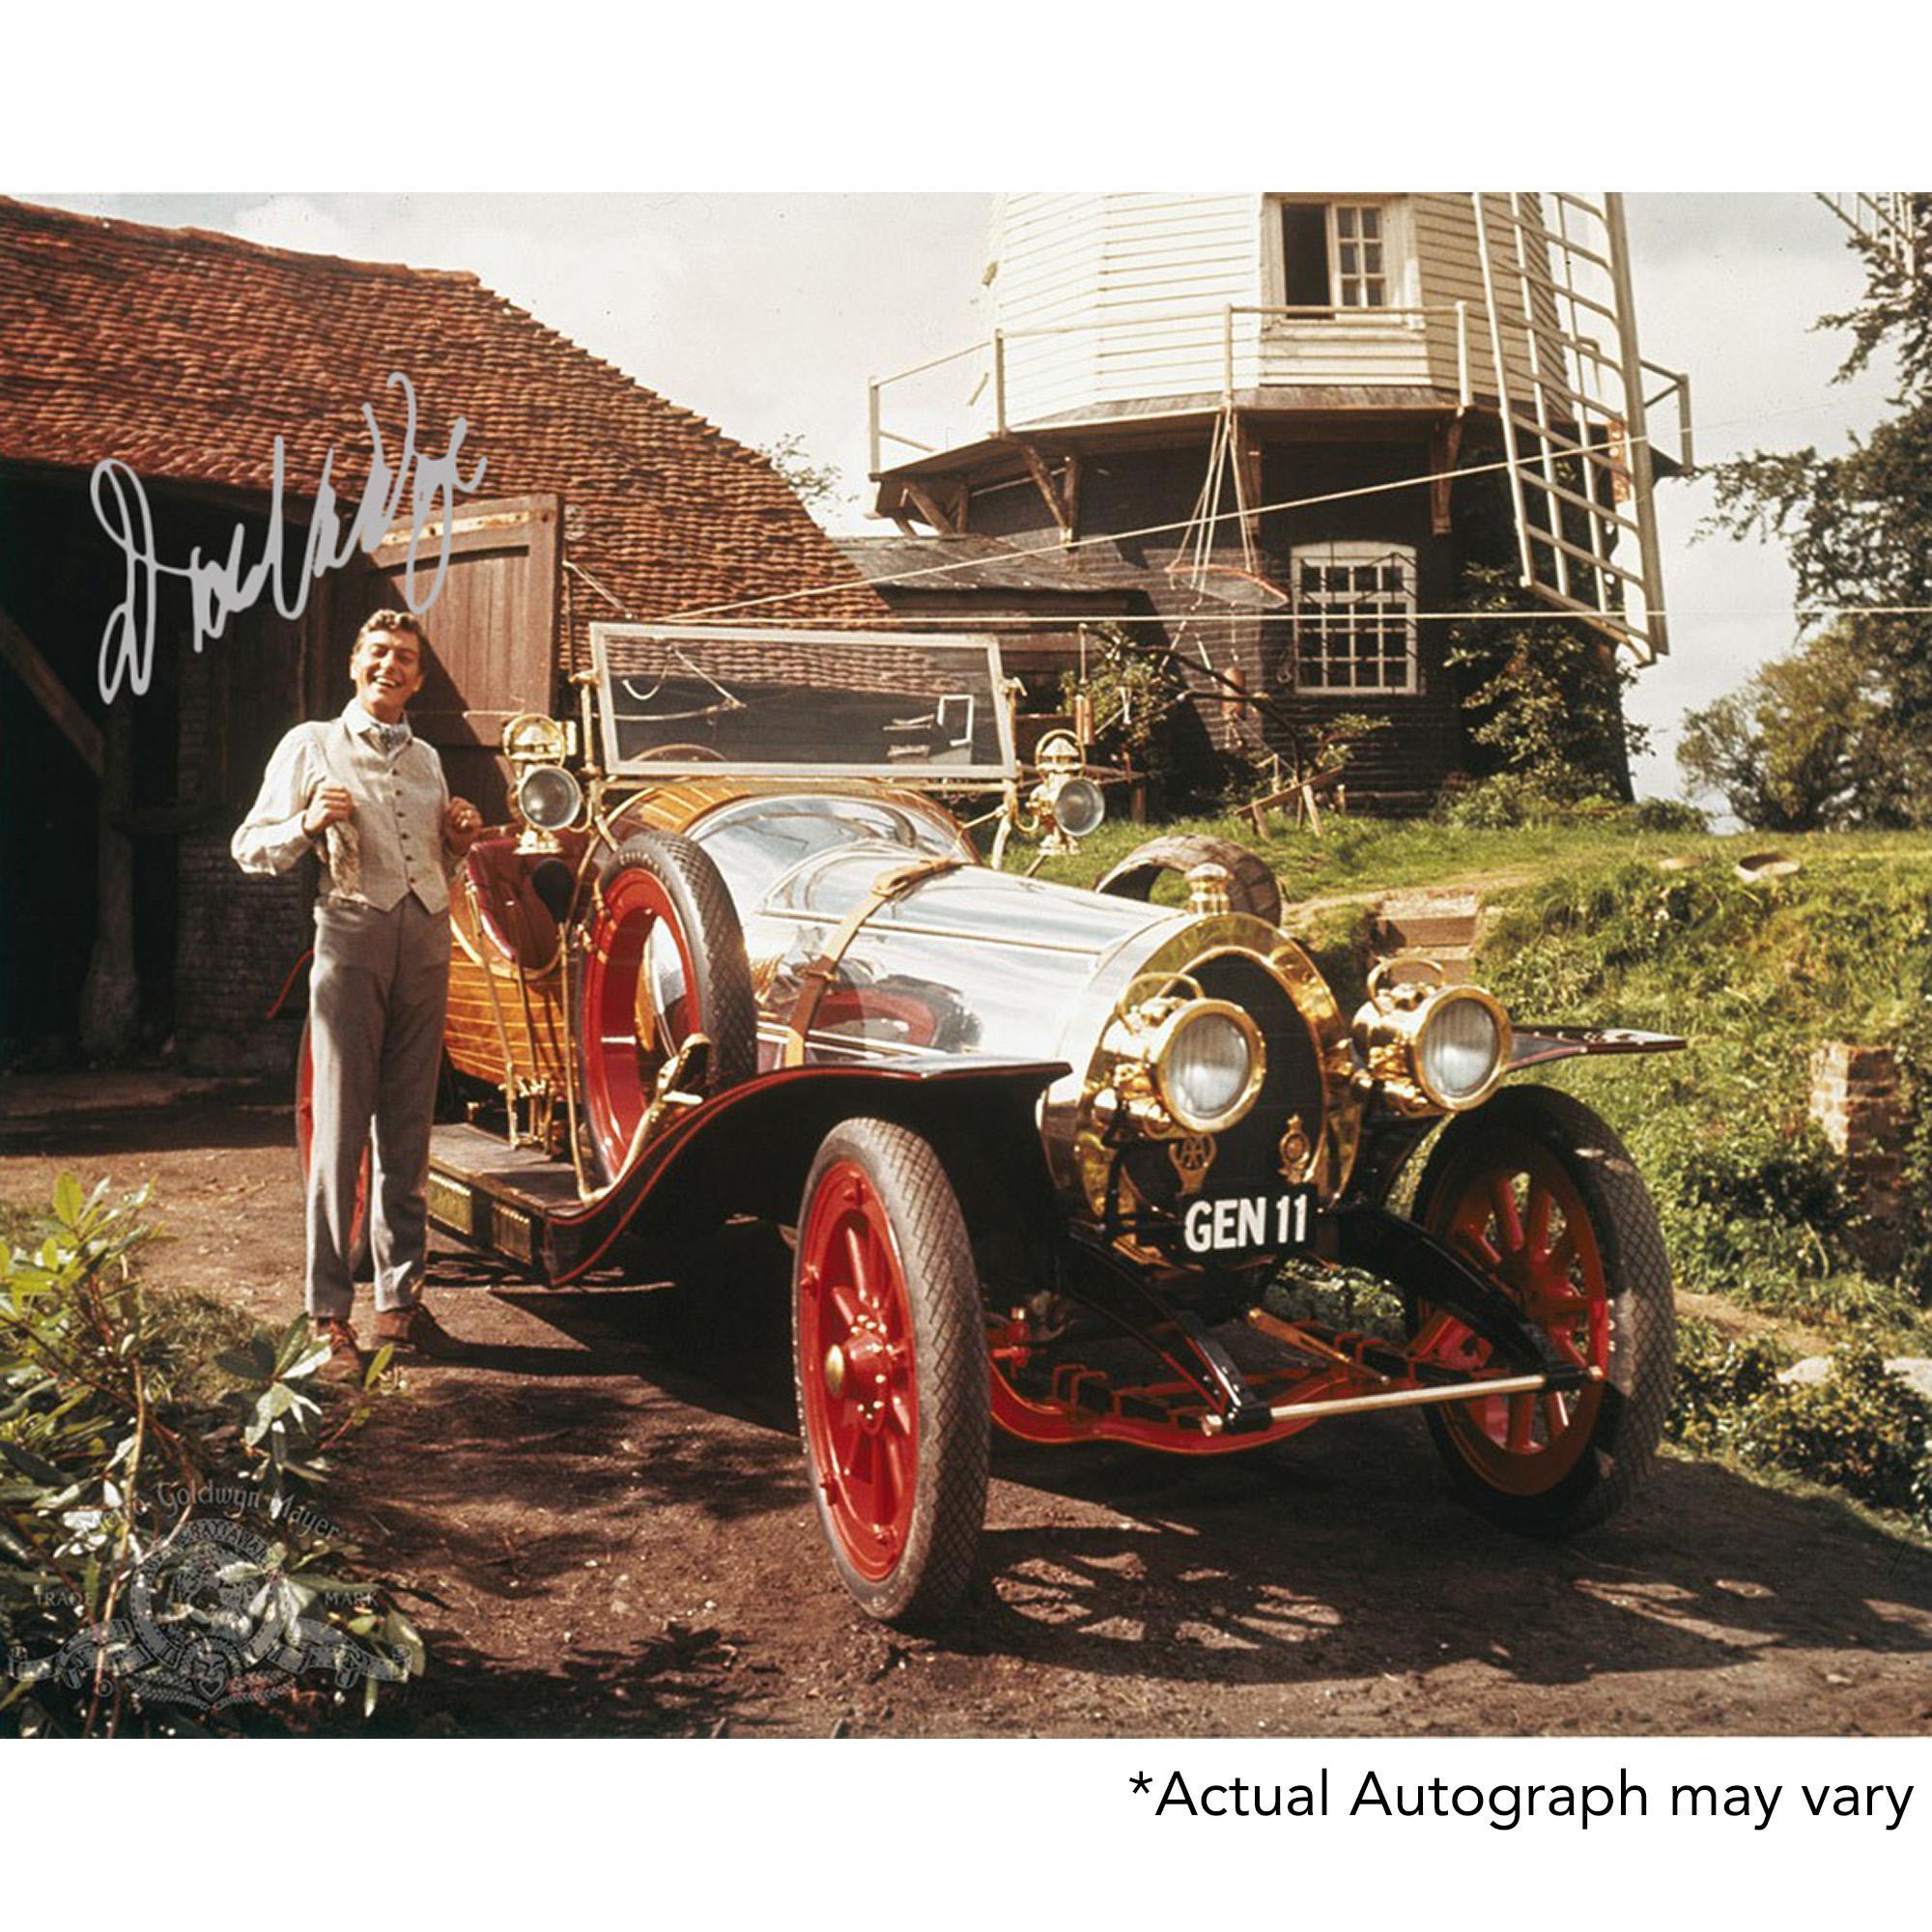 "Dick Van Dyke Autographed 11"" x 14"" Chitty Chitty Bang Bang with Car Photograph - Beckett COA"